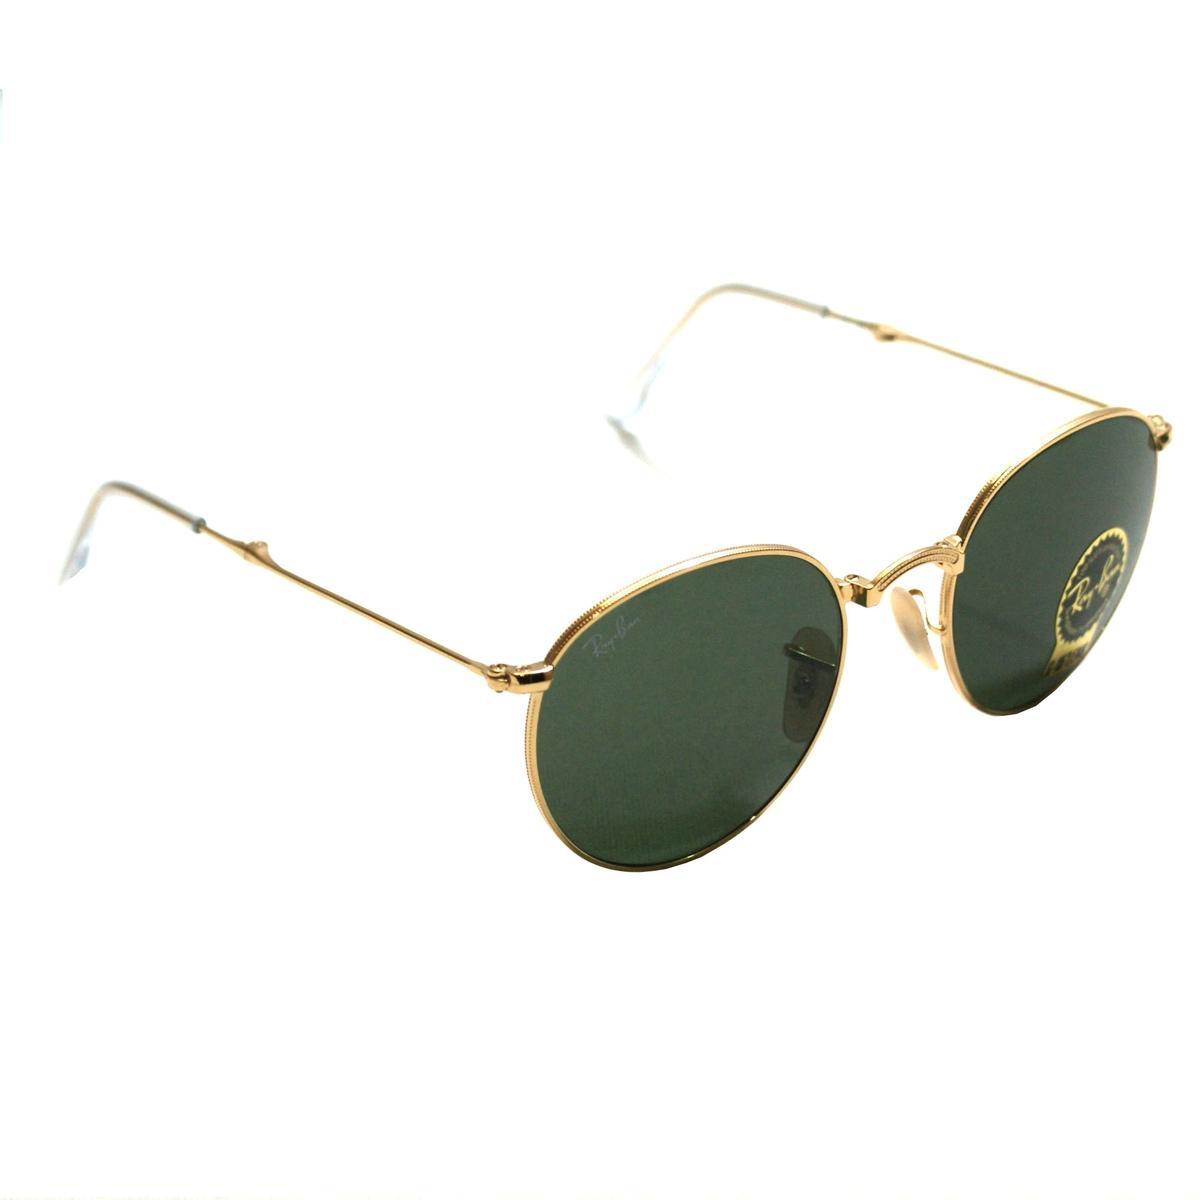 Ray Ban Ray Ban Round Folding Black Sunglasses Gold Rb